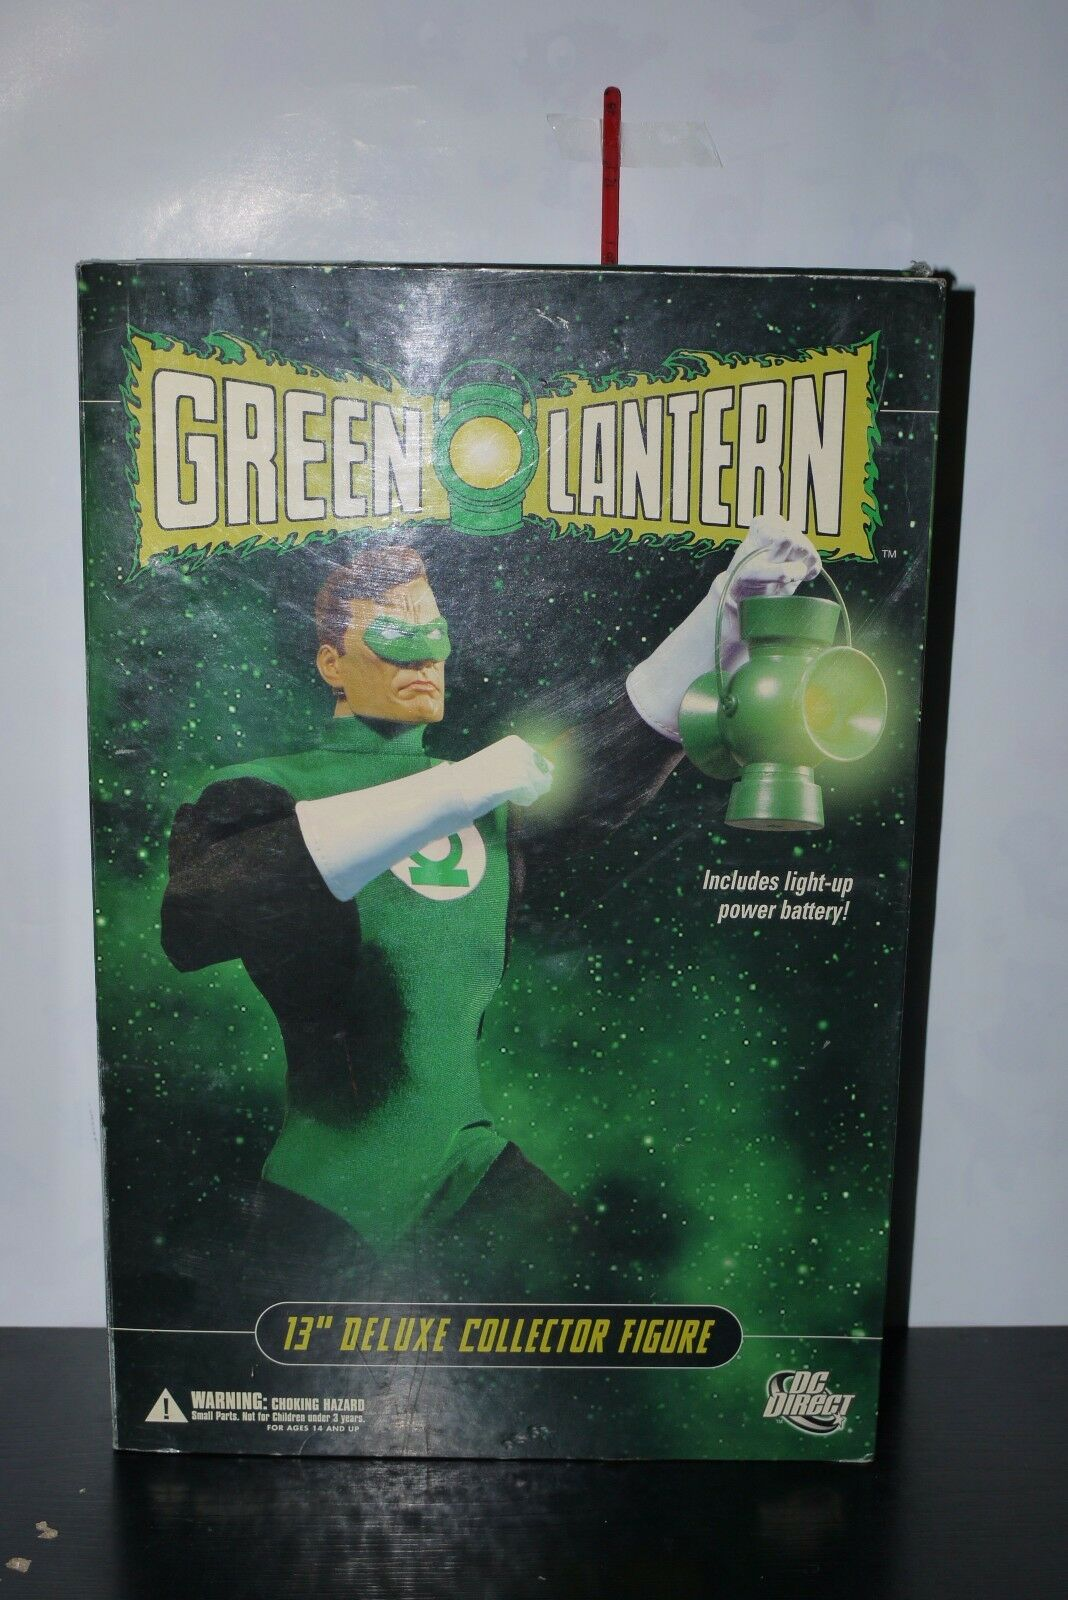 DC DIRECT GREEN LANTERN 13  DELUXE DELUXE DELUXE COLLECTOR FIGURE 1 6 SCALE HAL JORDAN BOXED 539820